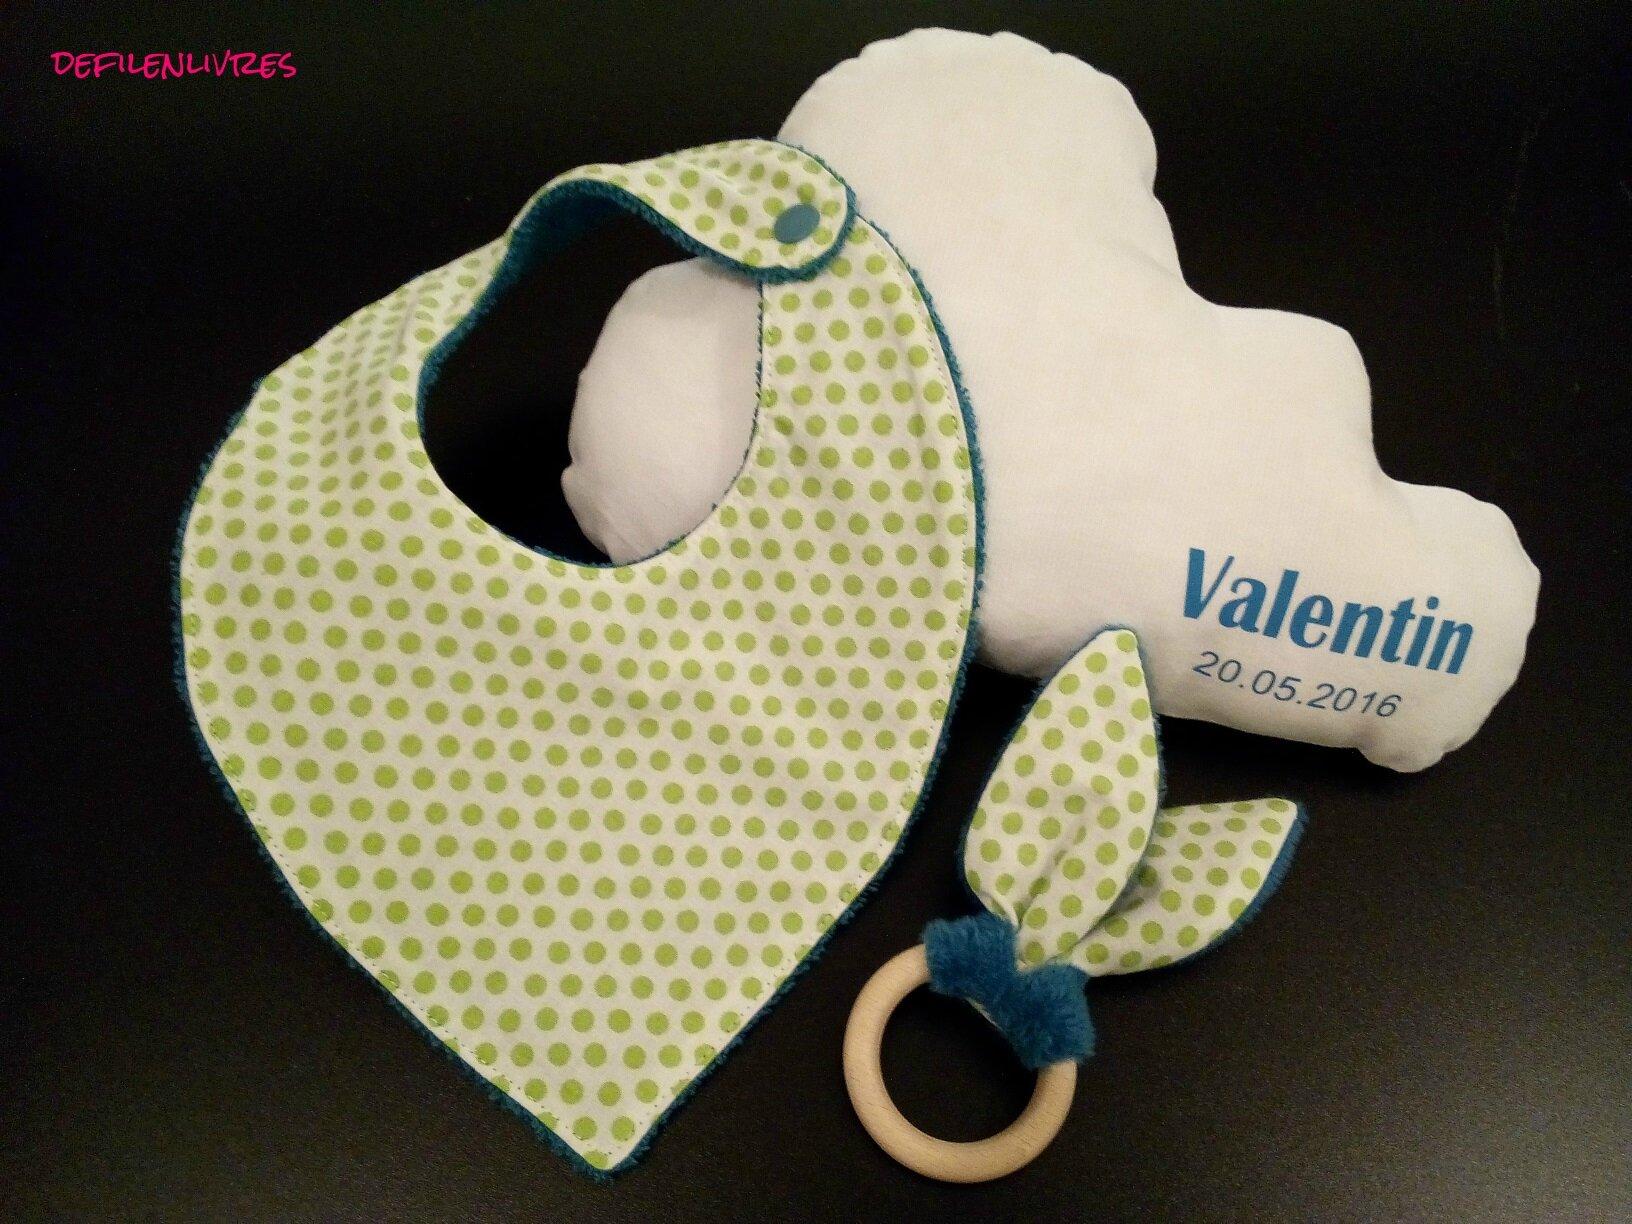 La babybox de Valentin